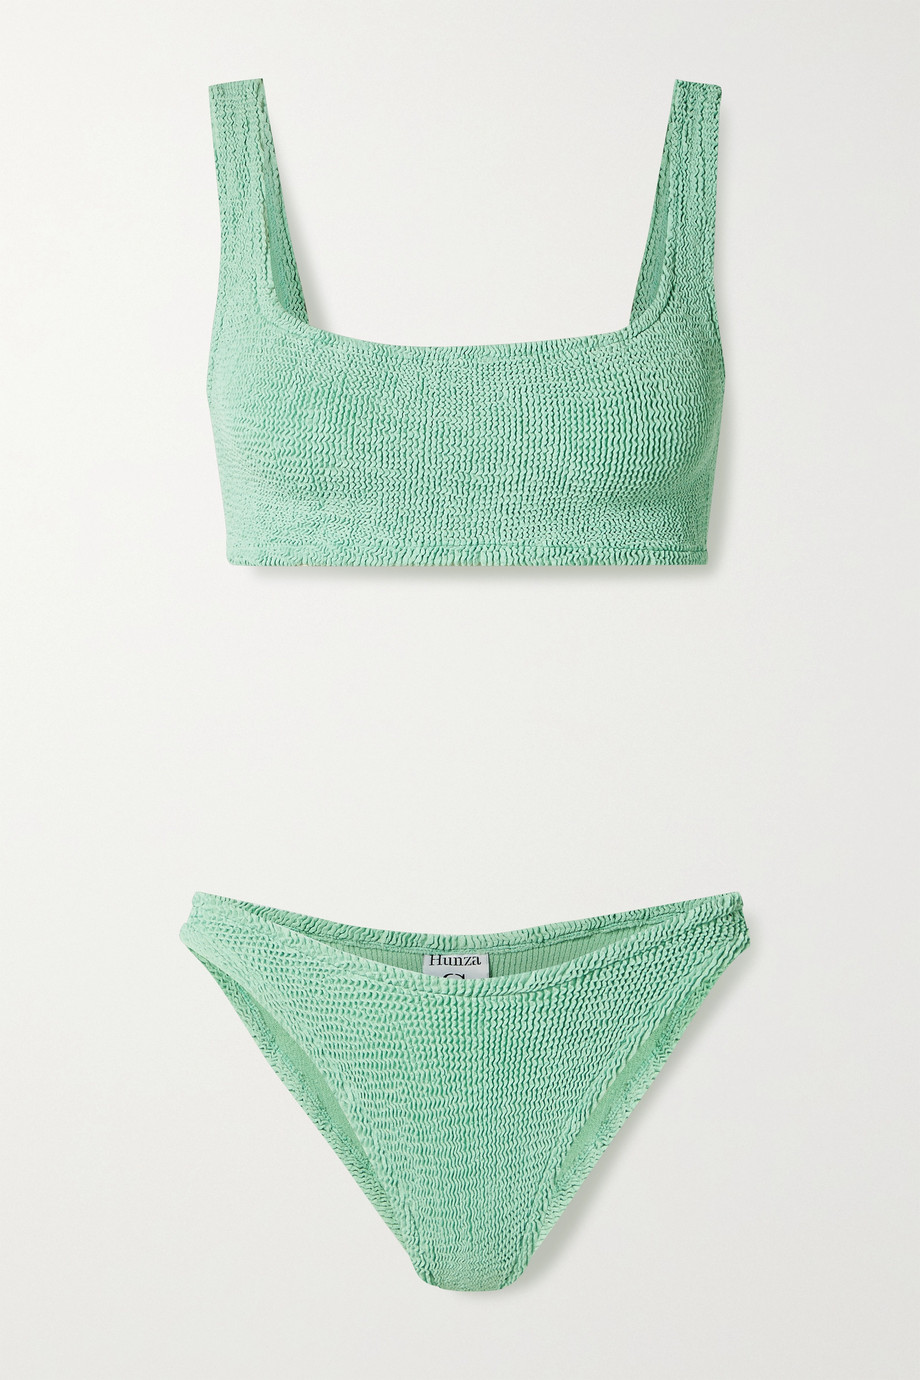 Hunza G Bikini en crépon Xandra - NET SUSTAIN